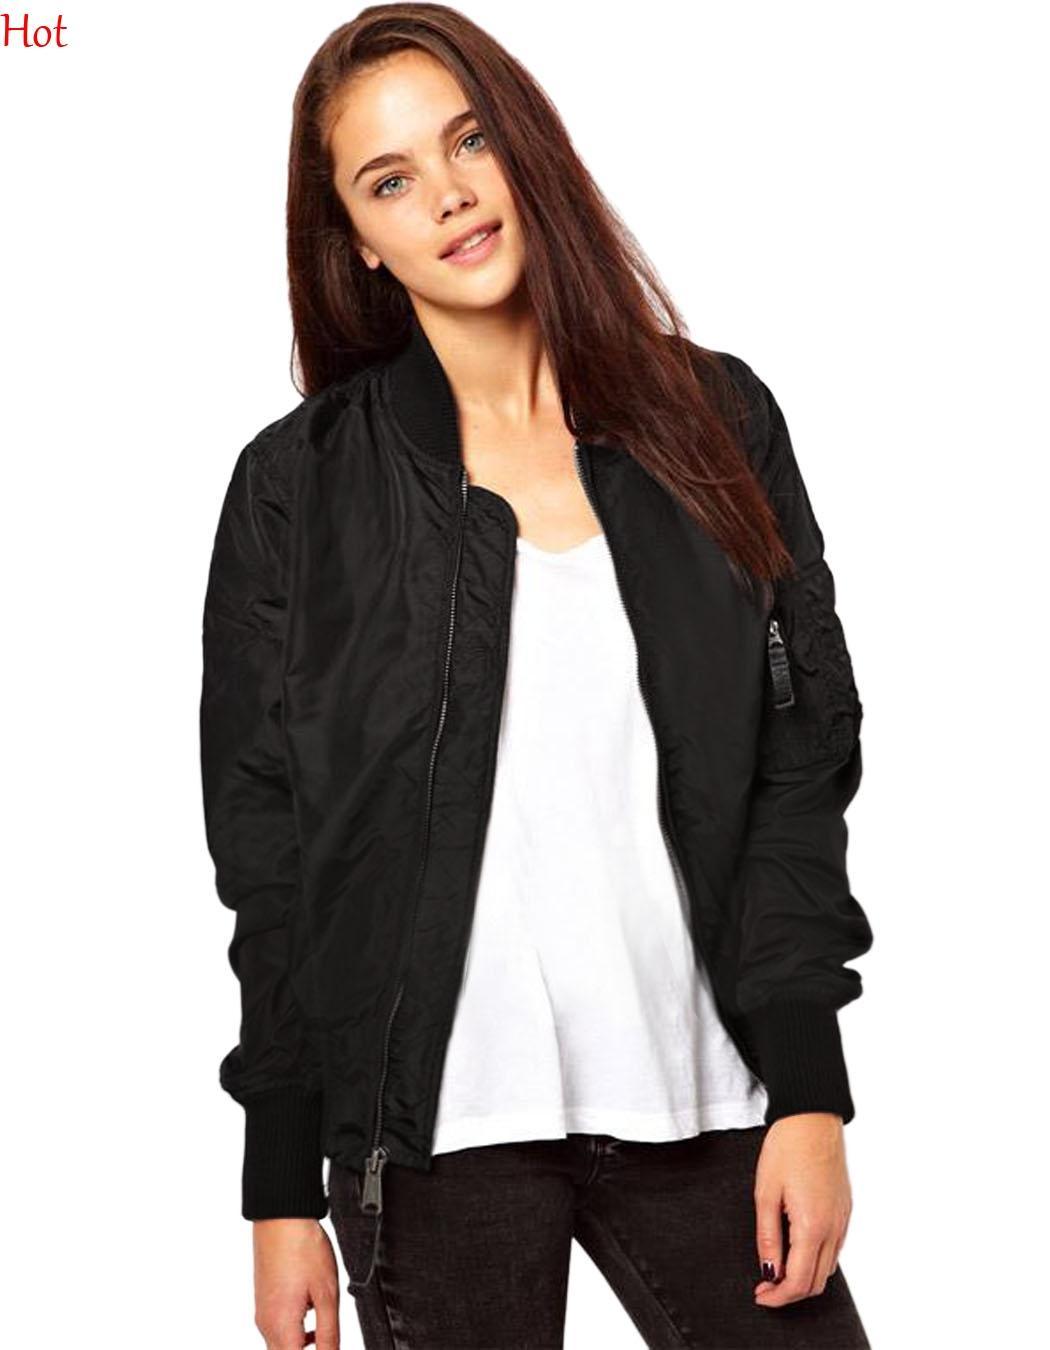 Women Bomber Jacket 2016 Autumn Spring Ladies Jackets Tops Solid Color Zipper Baseball Coats Slim Sport Jackets Women Black Green SV027216